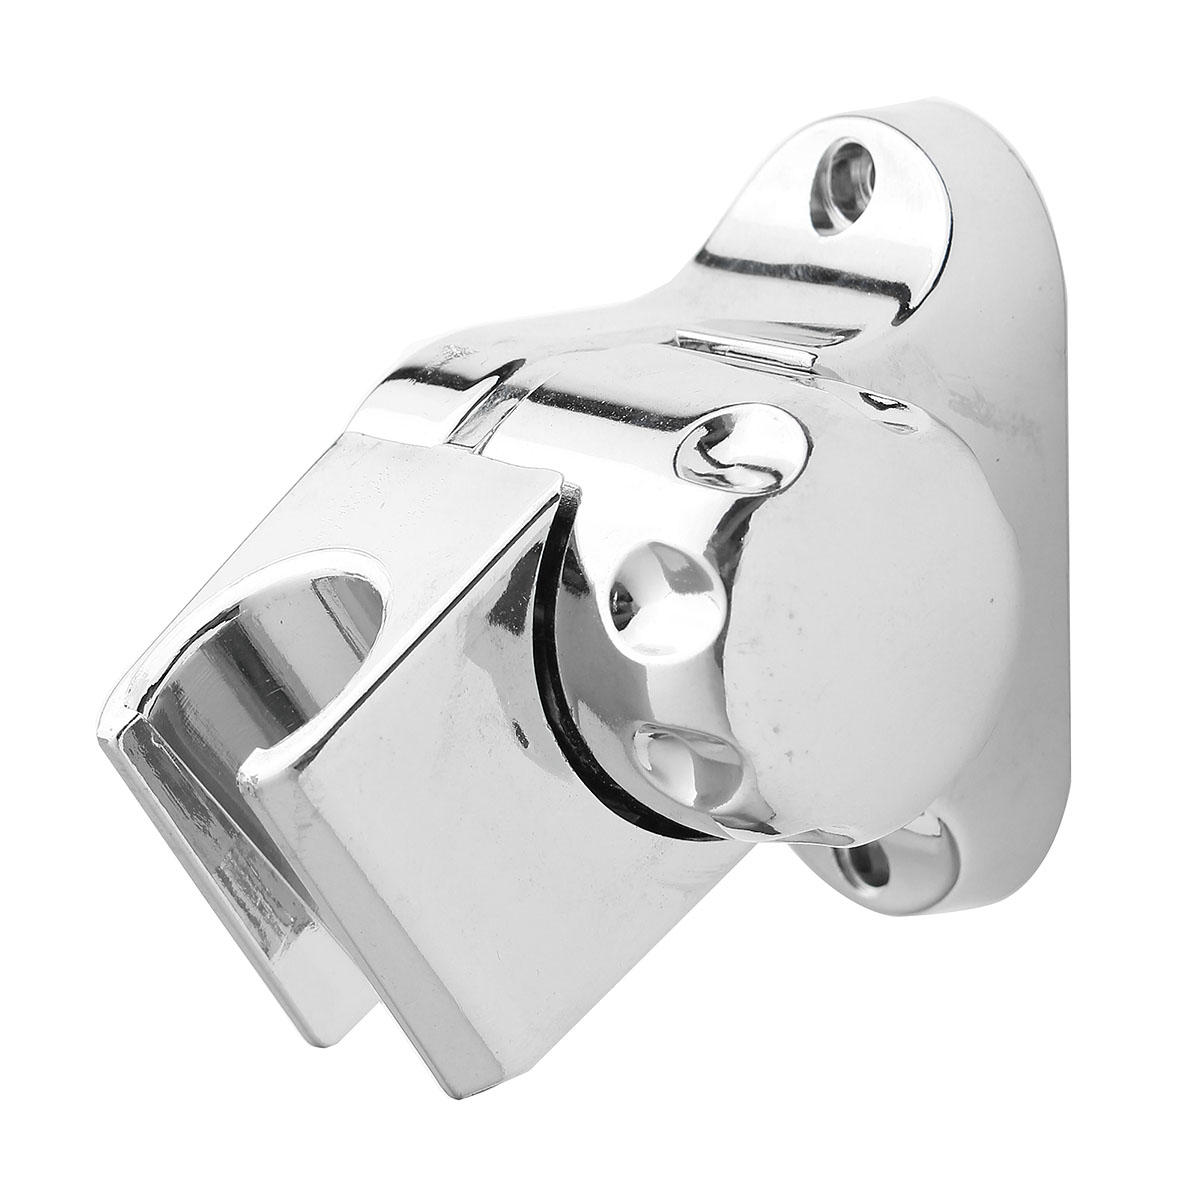 Bathroom Handheld Shower Head Holder Adjustable Wall Mount Base Bracket With Screws